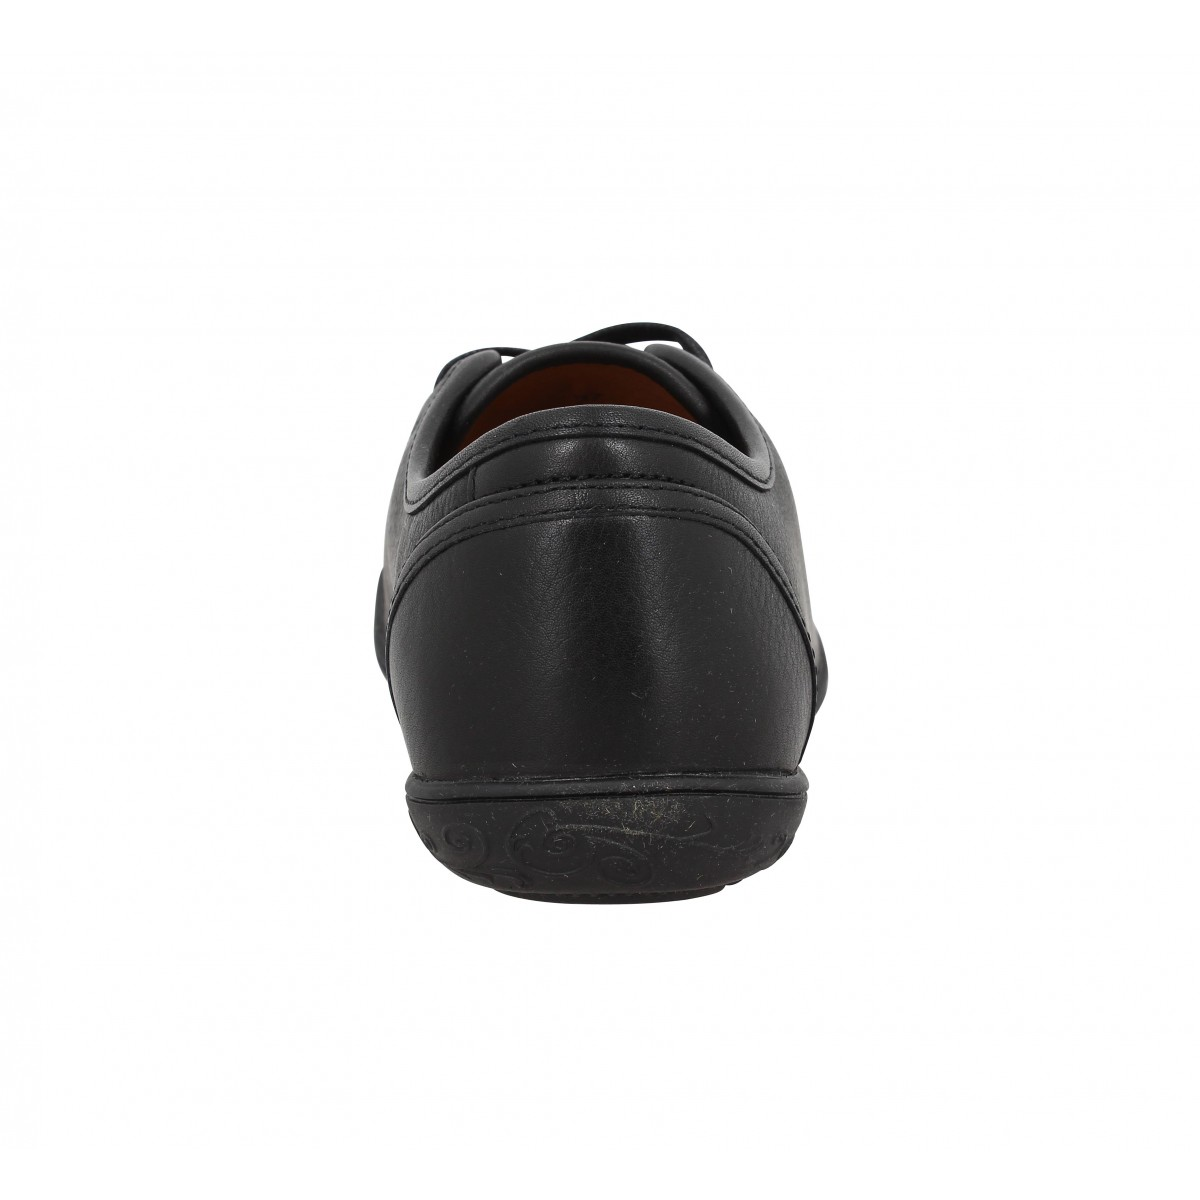 6851a56dc17 Baskets PALLADIUM Game BFO cuir Femme Noir. 1